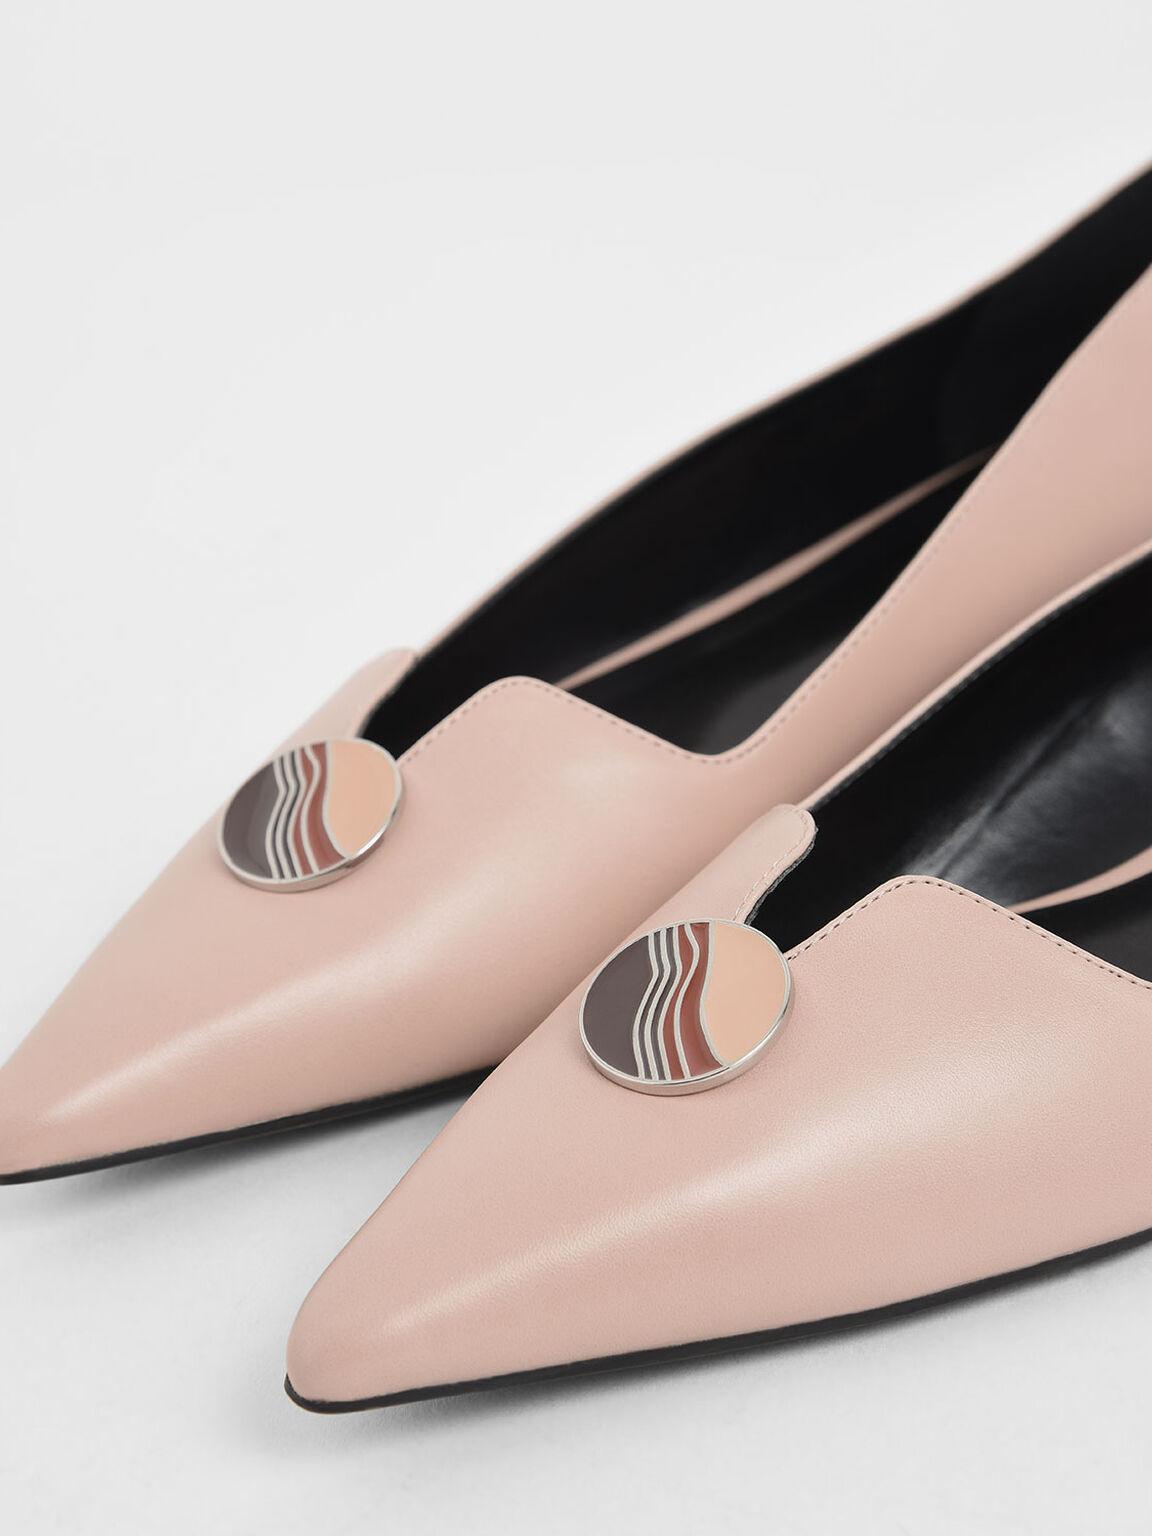 Button Detail Ballerina Flats, Nude, hi-res